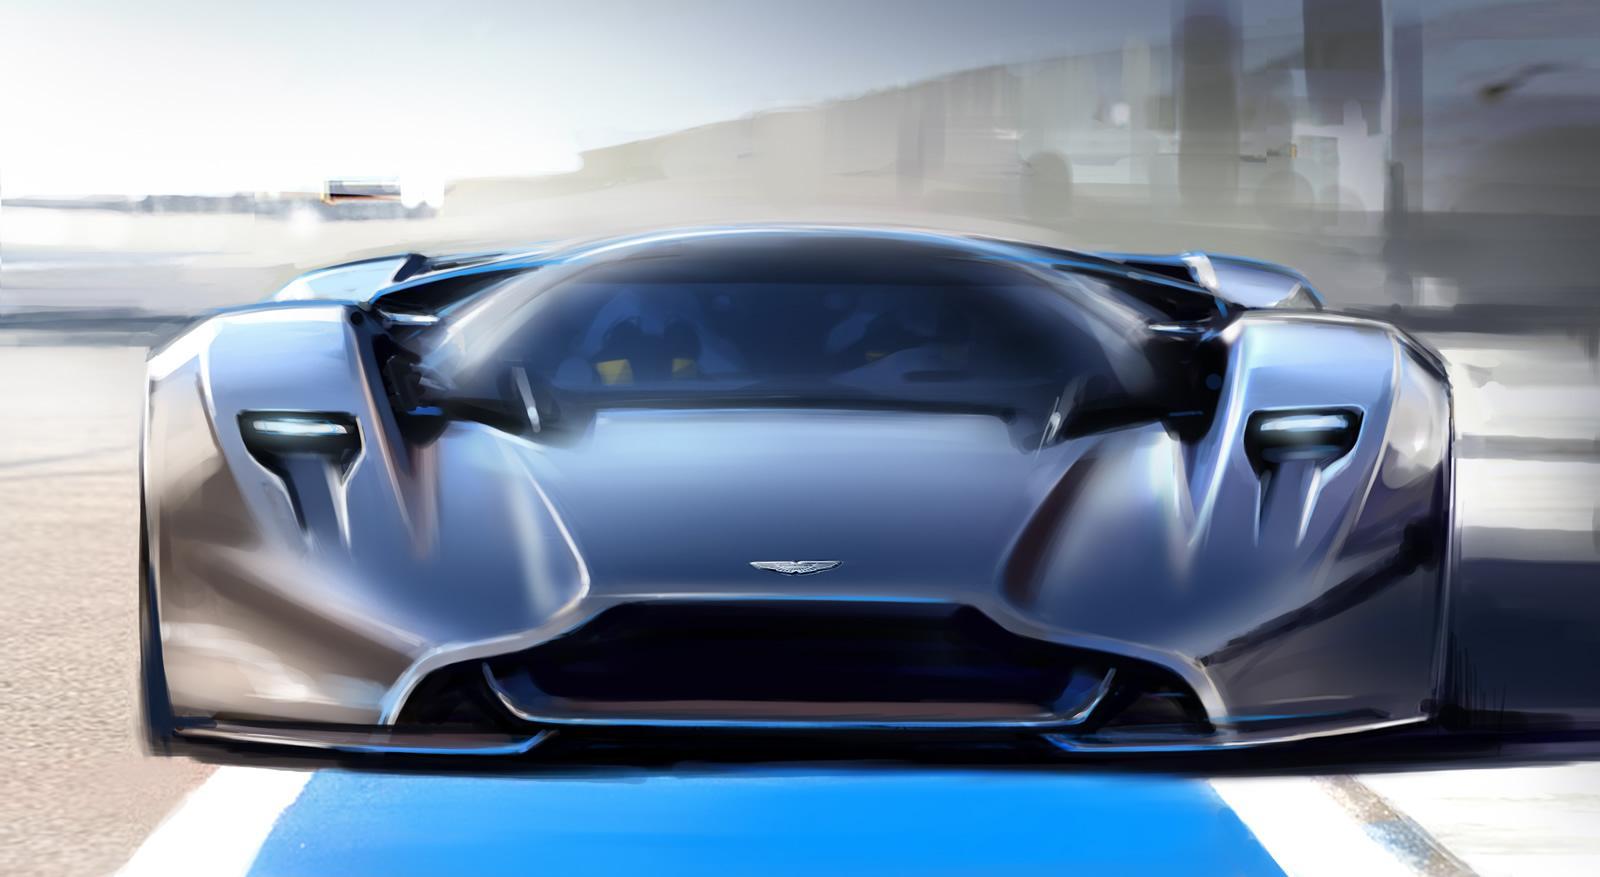 Aston Martin DP100 Vision Gran Turismo photos  PhotoGallery with